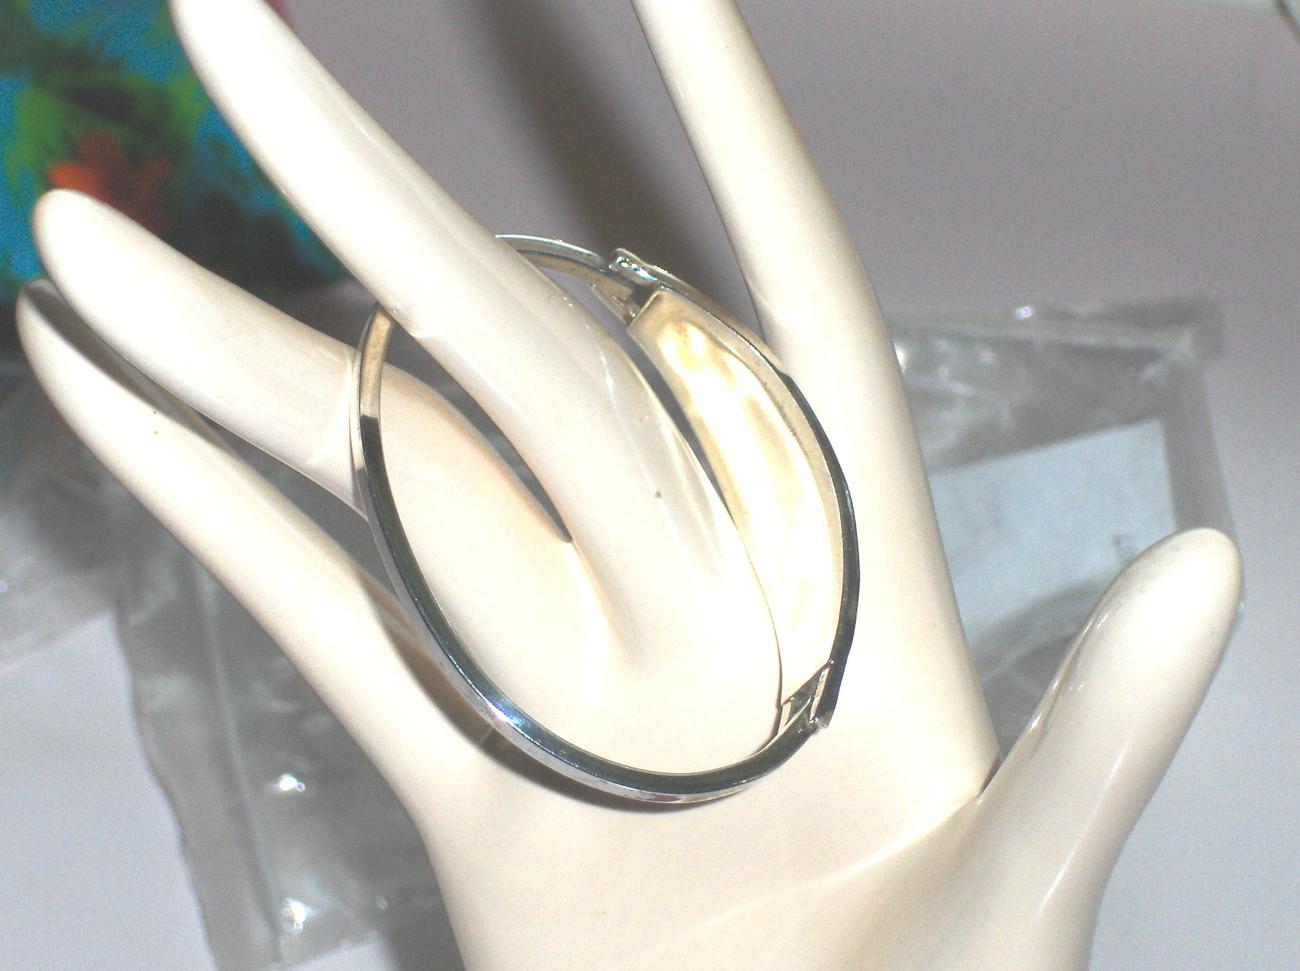 Vintage Inlaid and Enameled Flower Bracelet